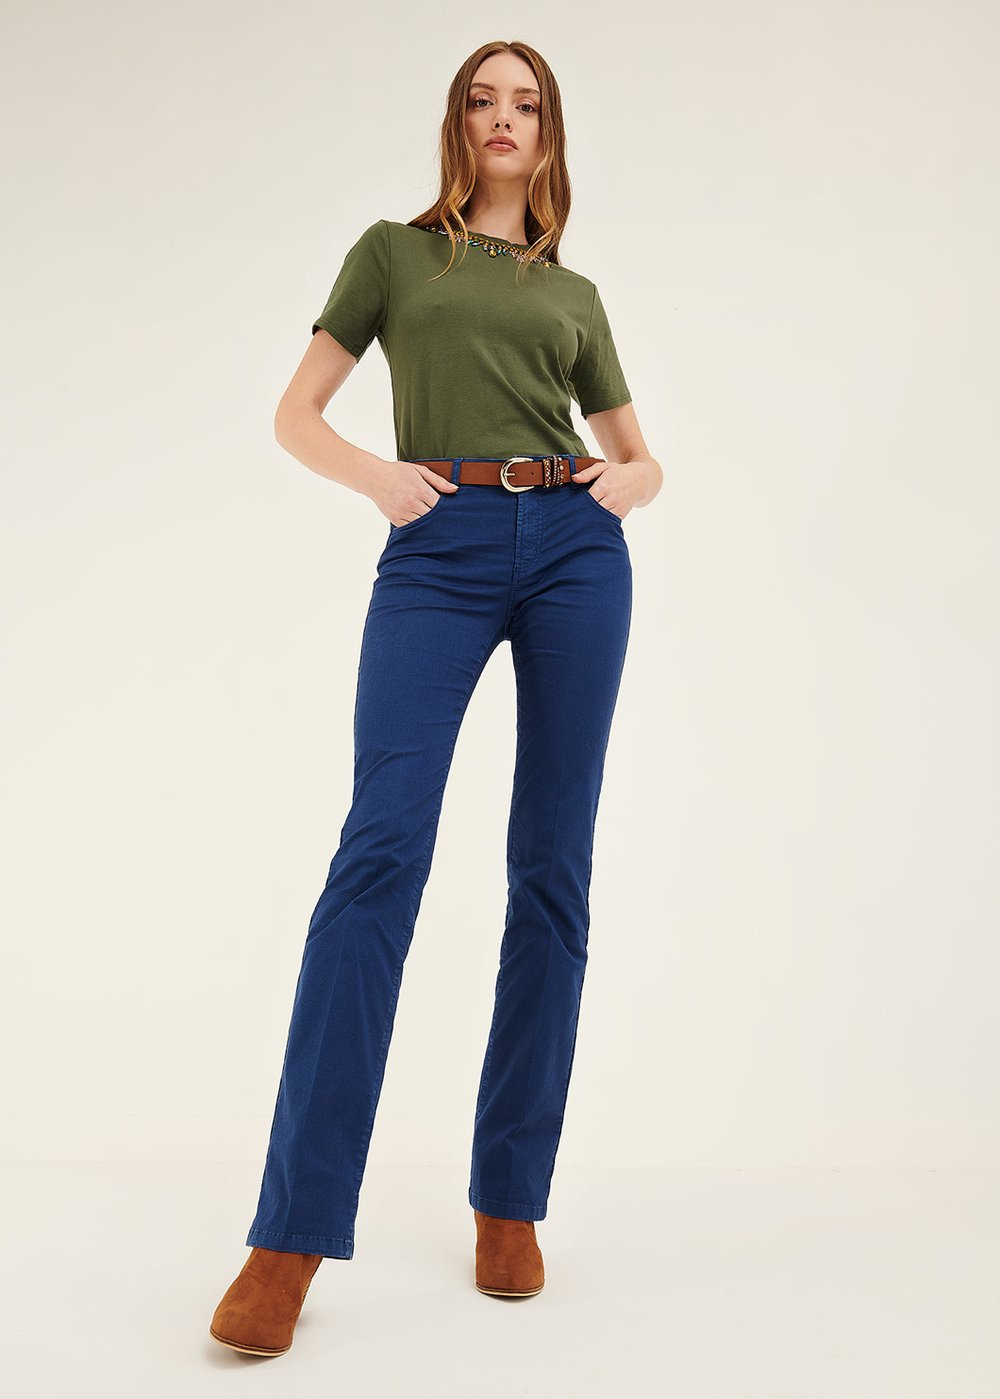 Pantalone modello Cindy modello zampa - Avion - Donna